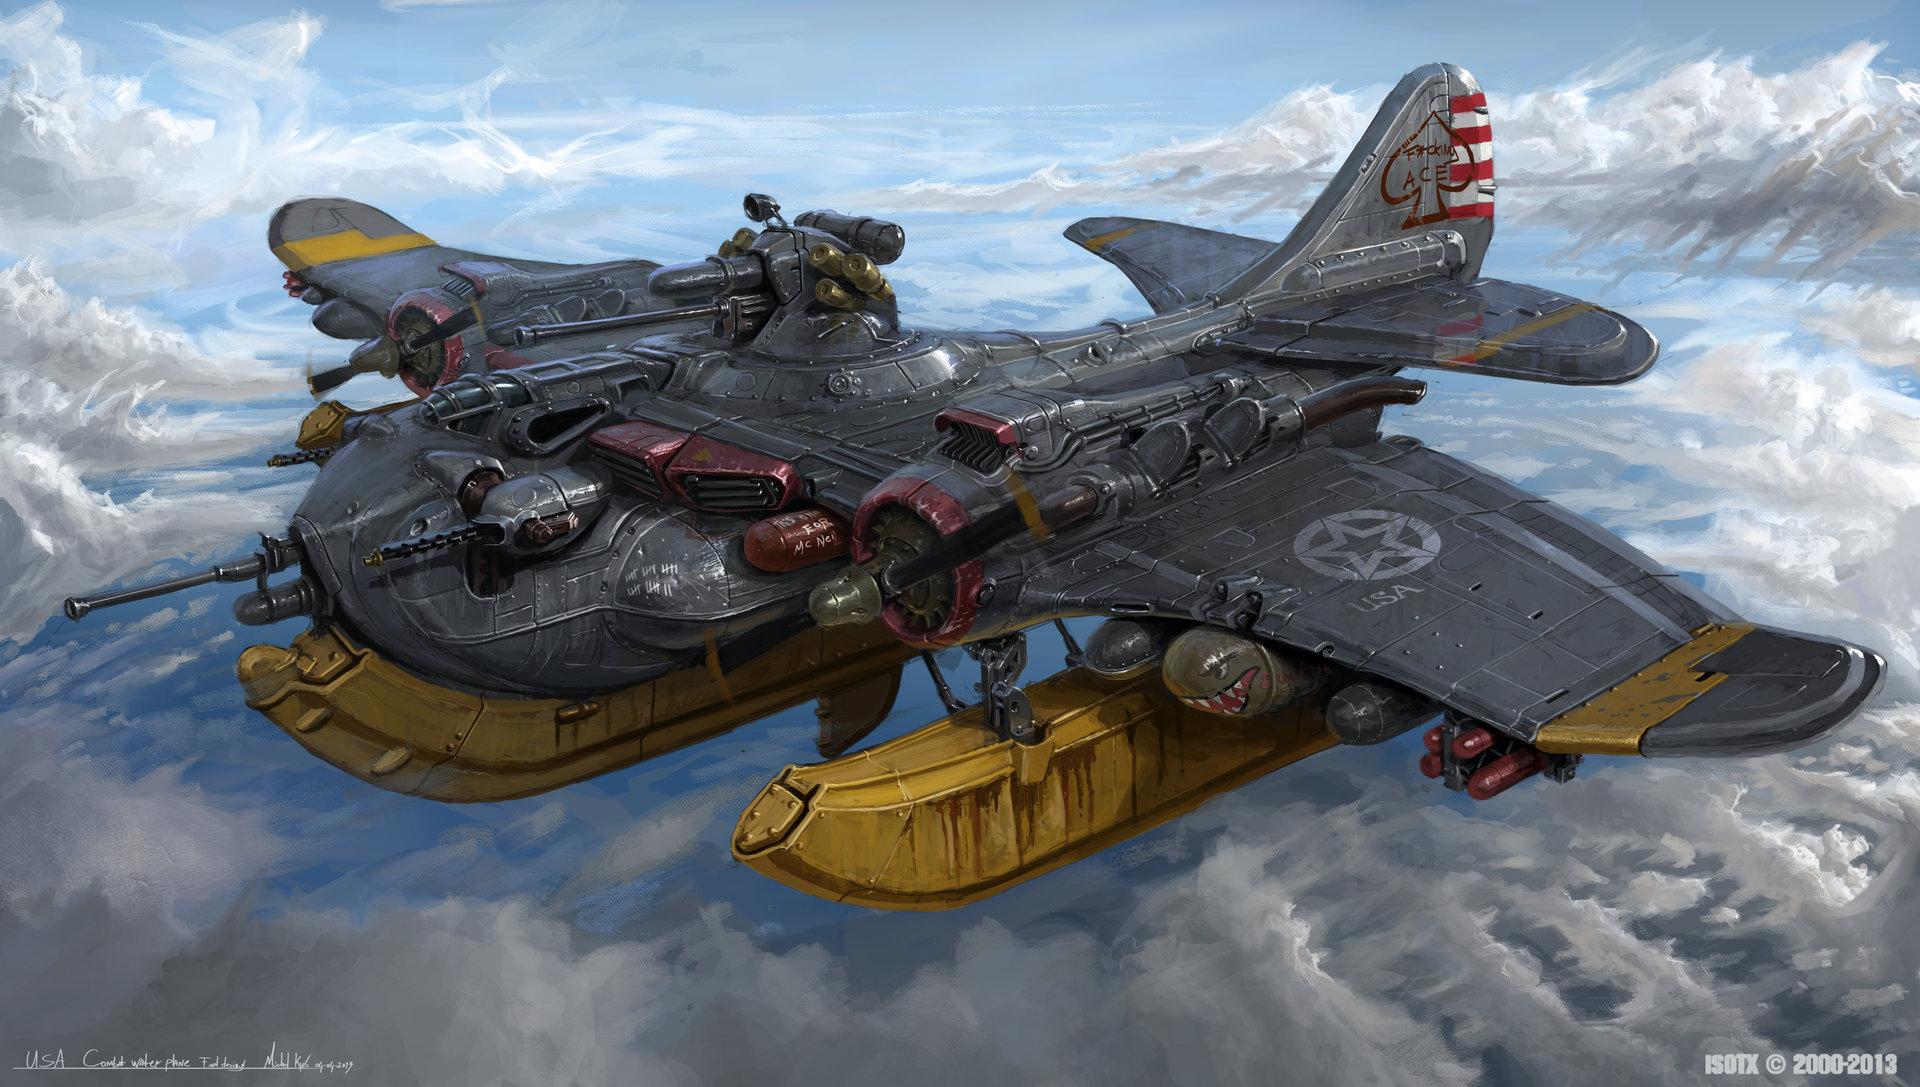 Michal kus usa combat water plane final